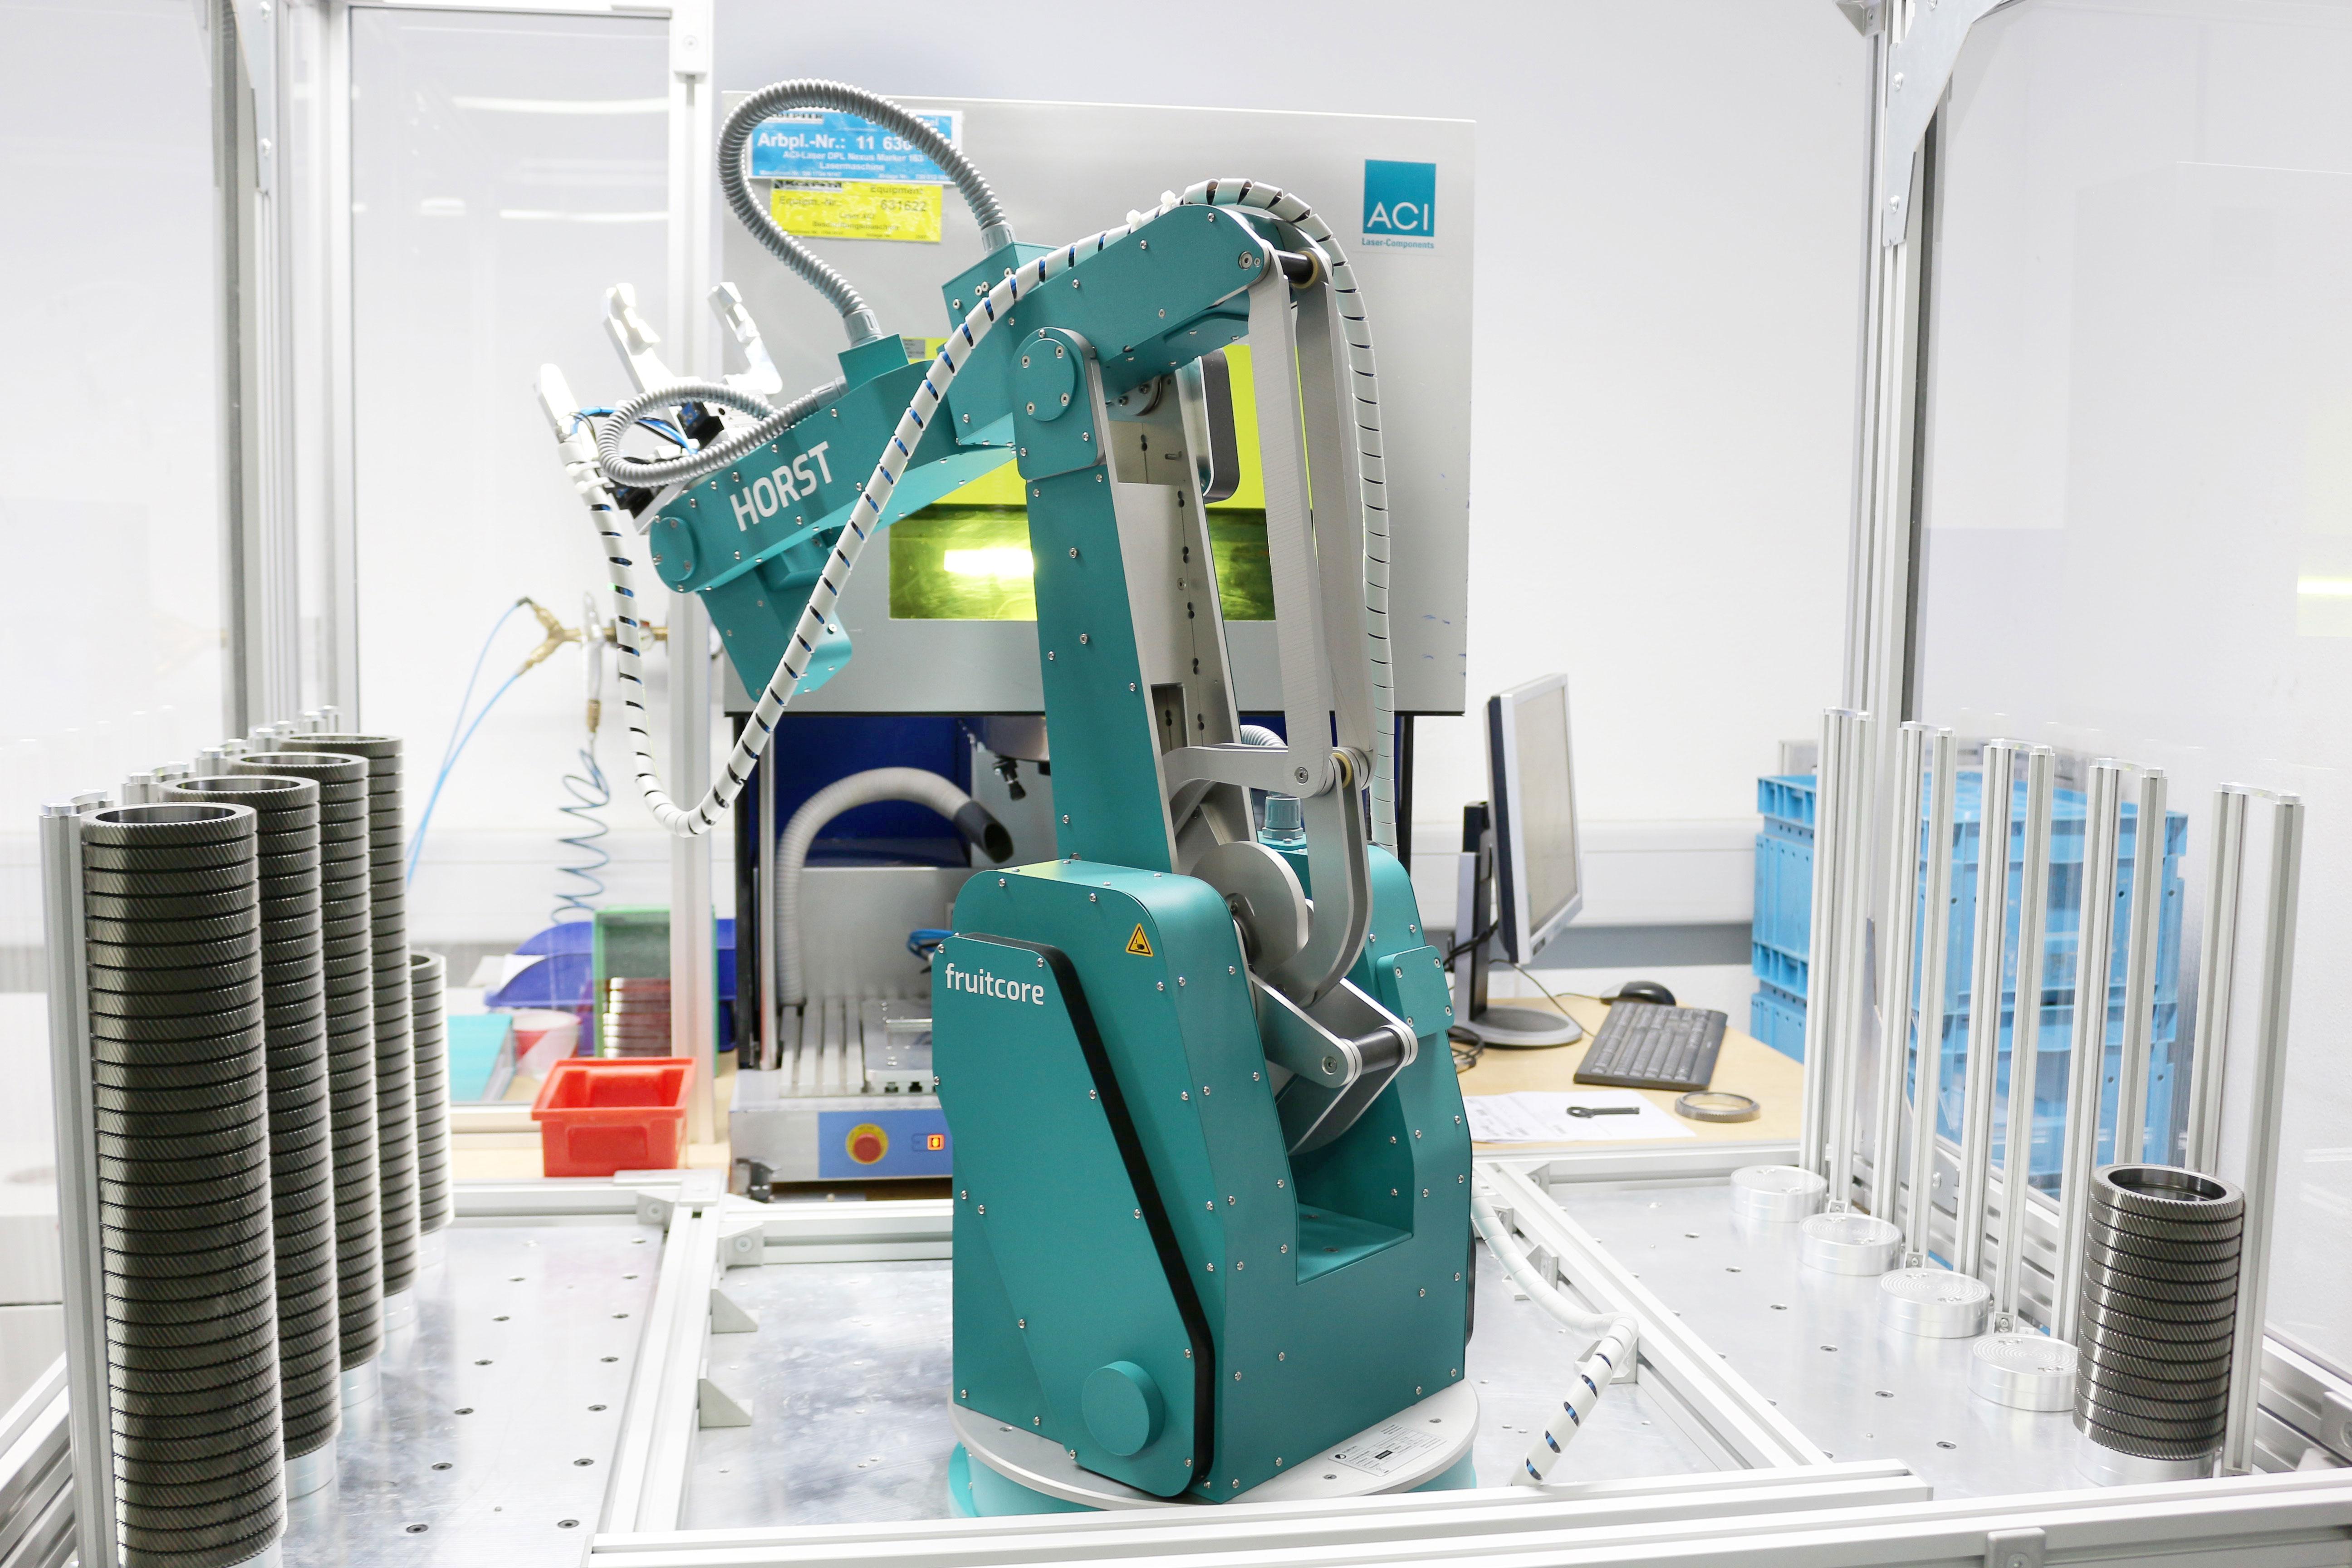 fruitcore robotics - Industrieroboter HORST bei Koepfer